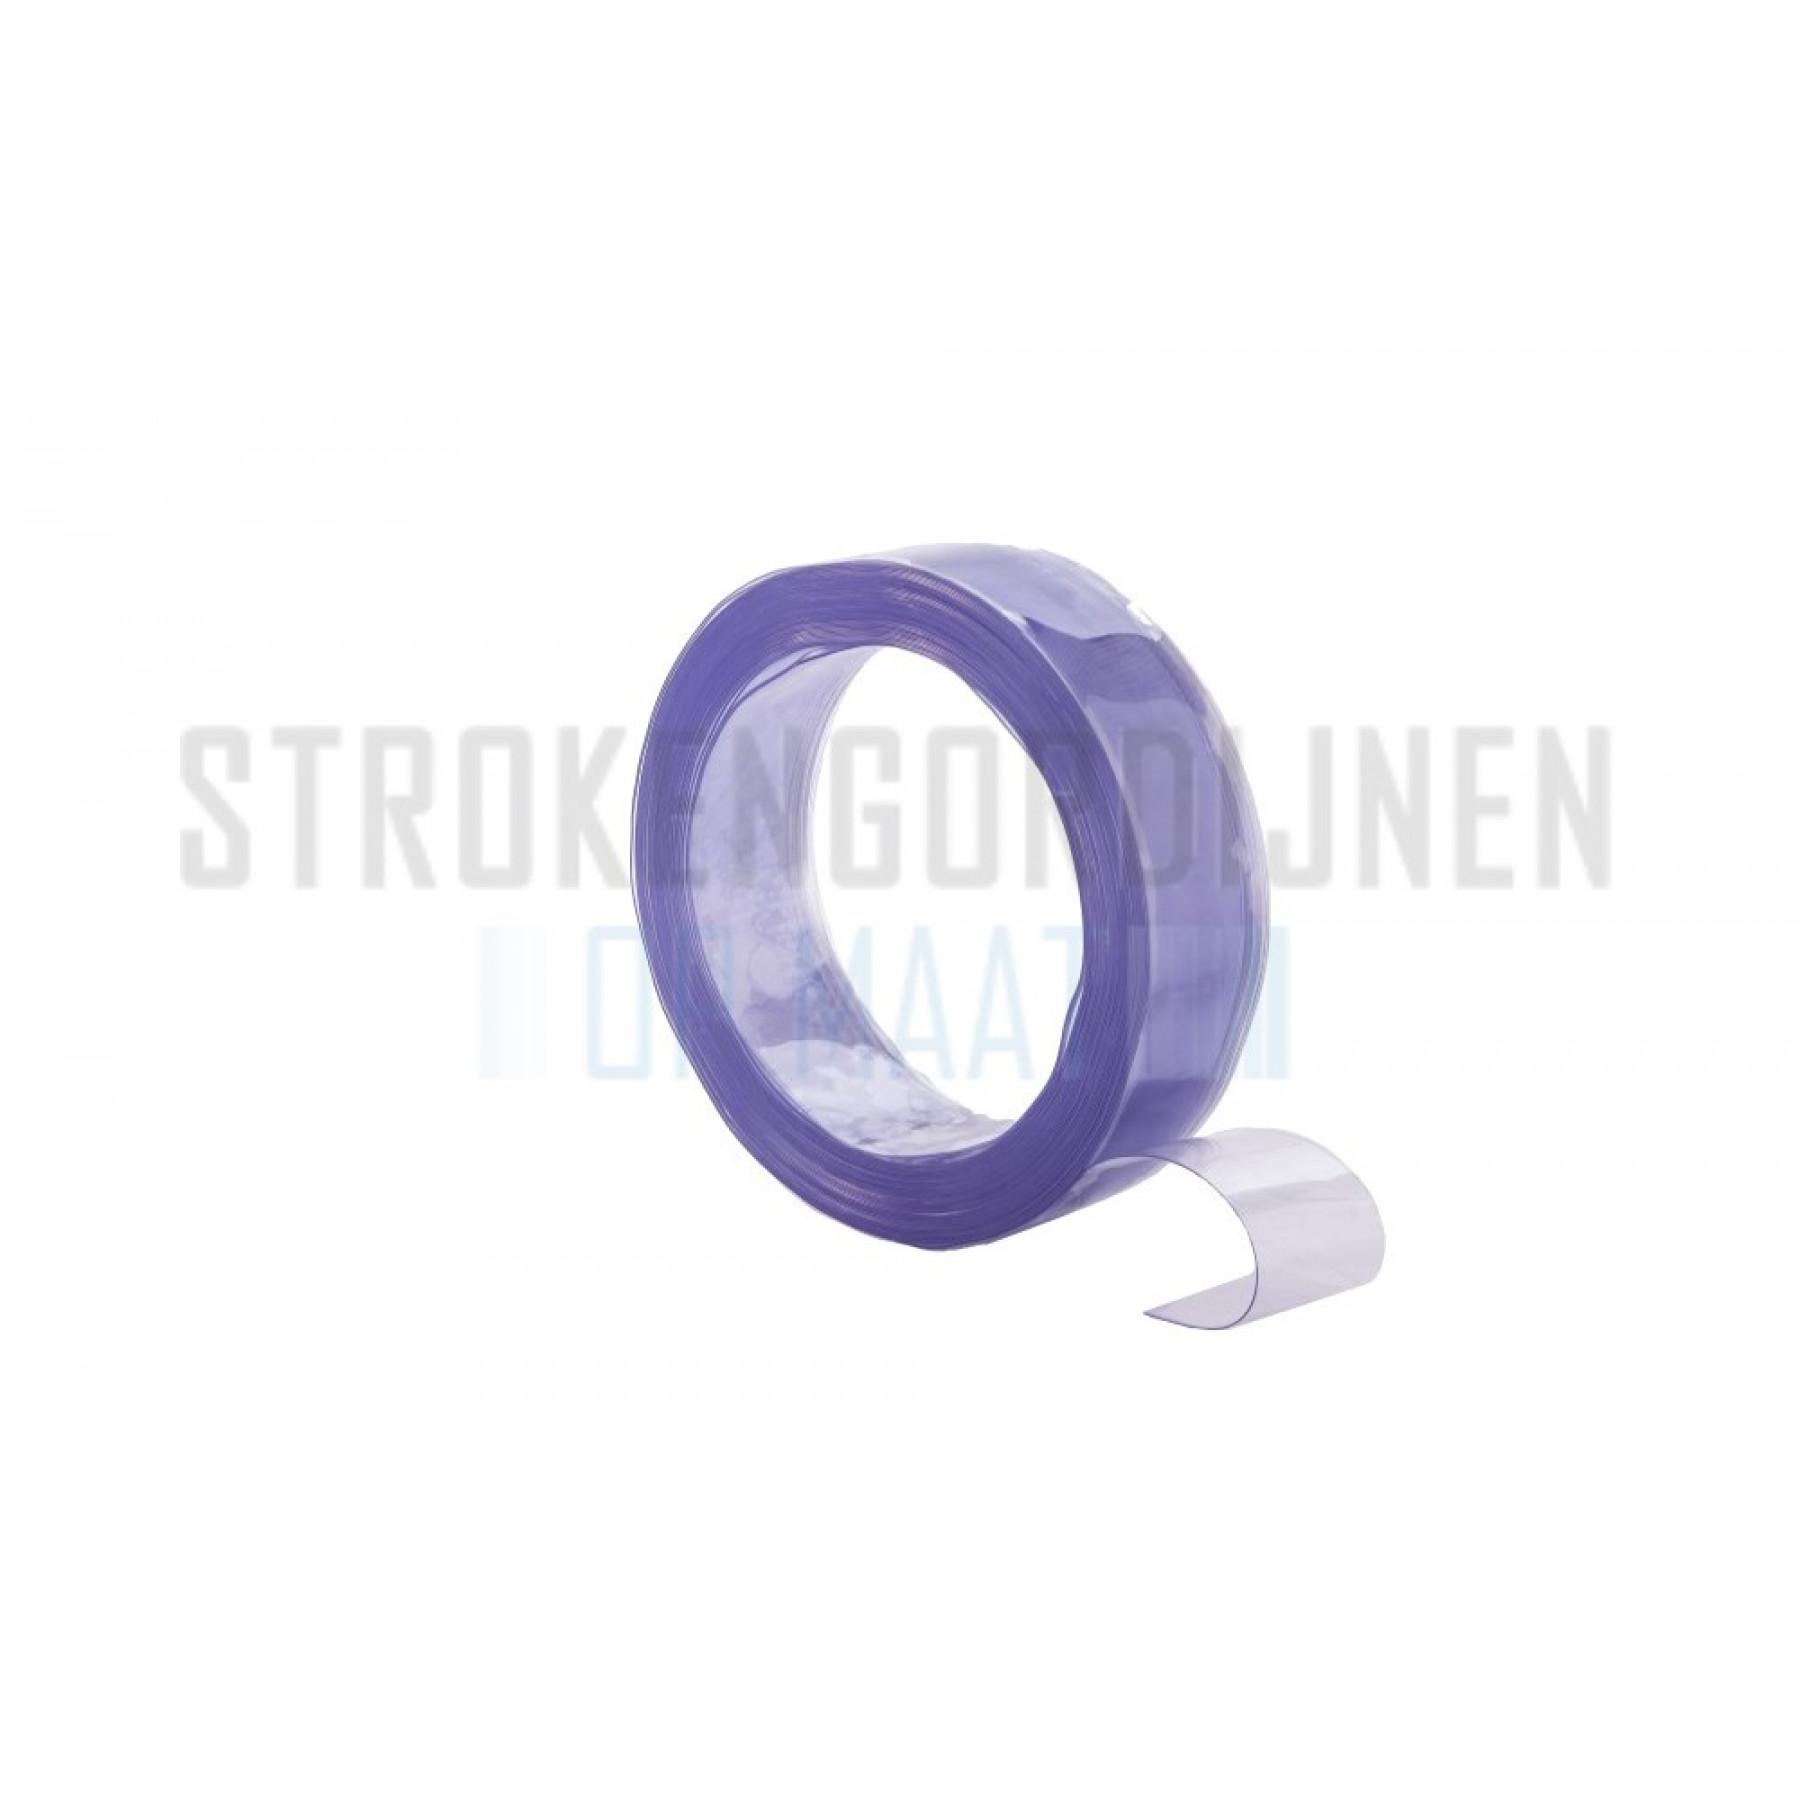 PVC Rolle, 100mm breit, 1.2mm dick, 50 Meter lang, transparent